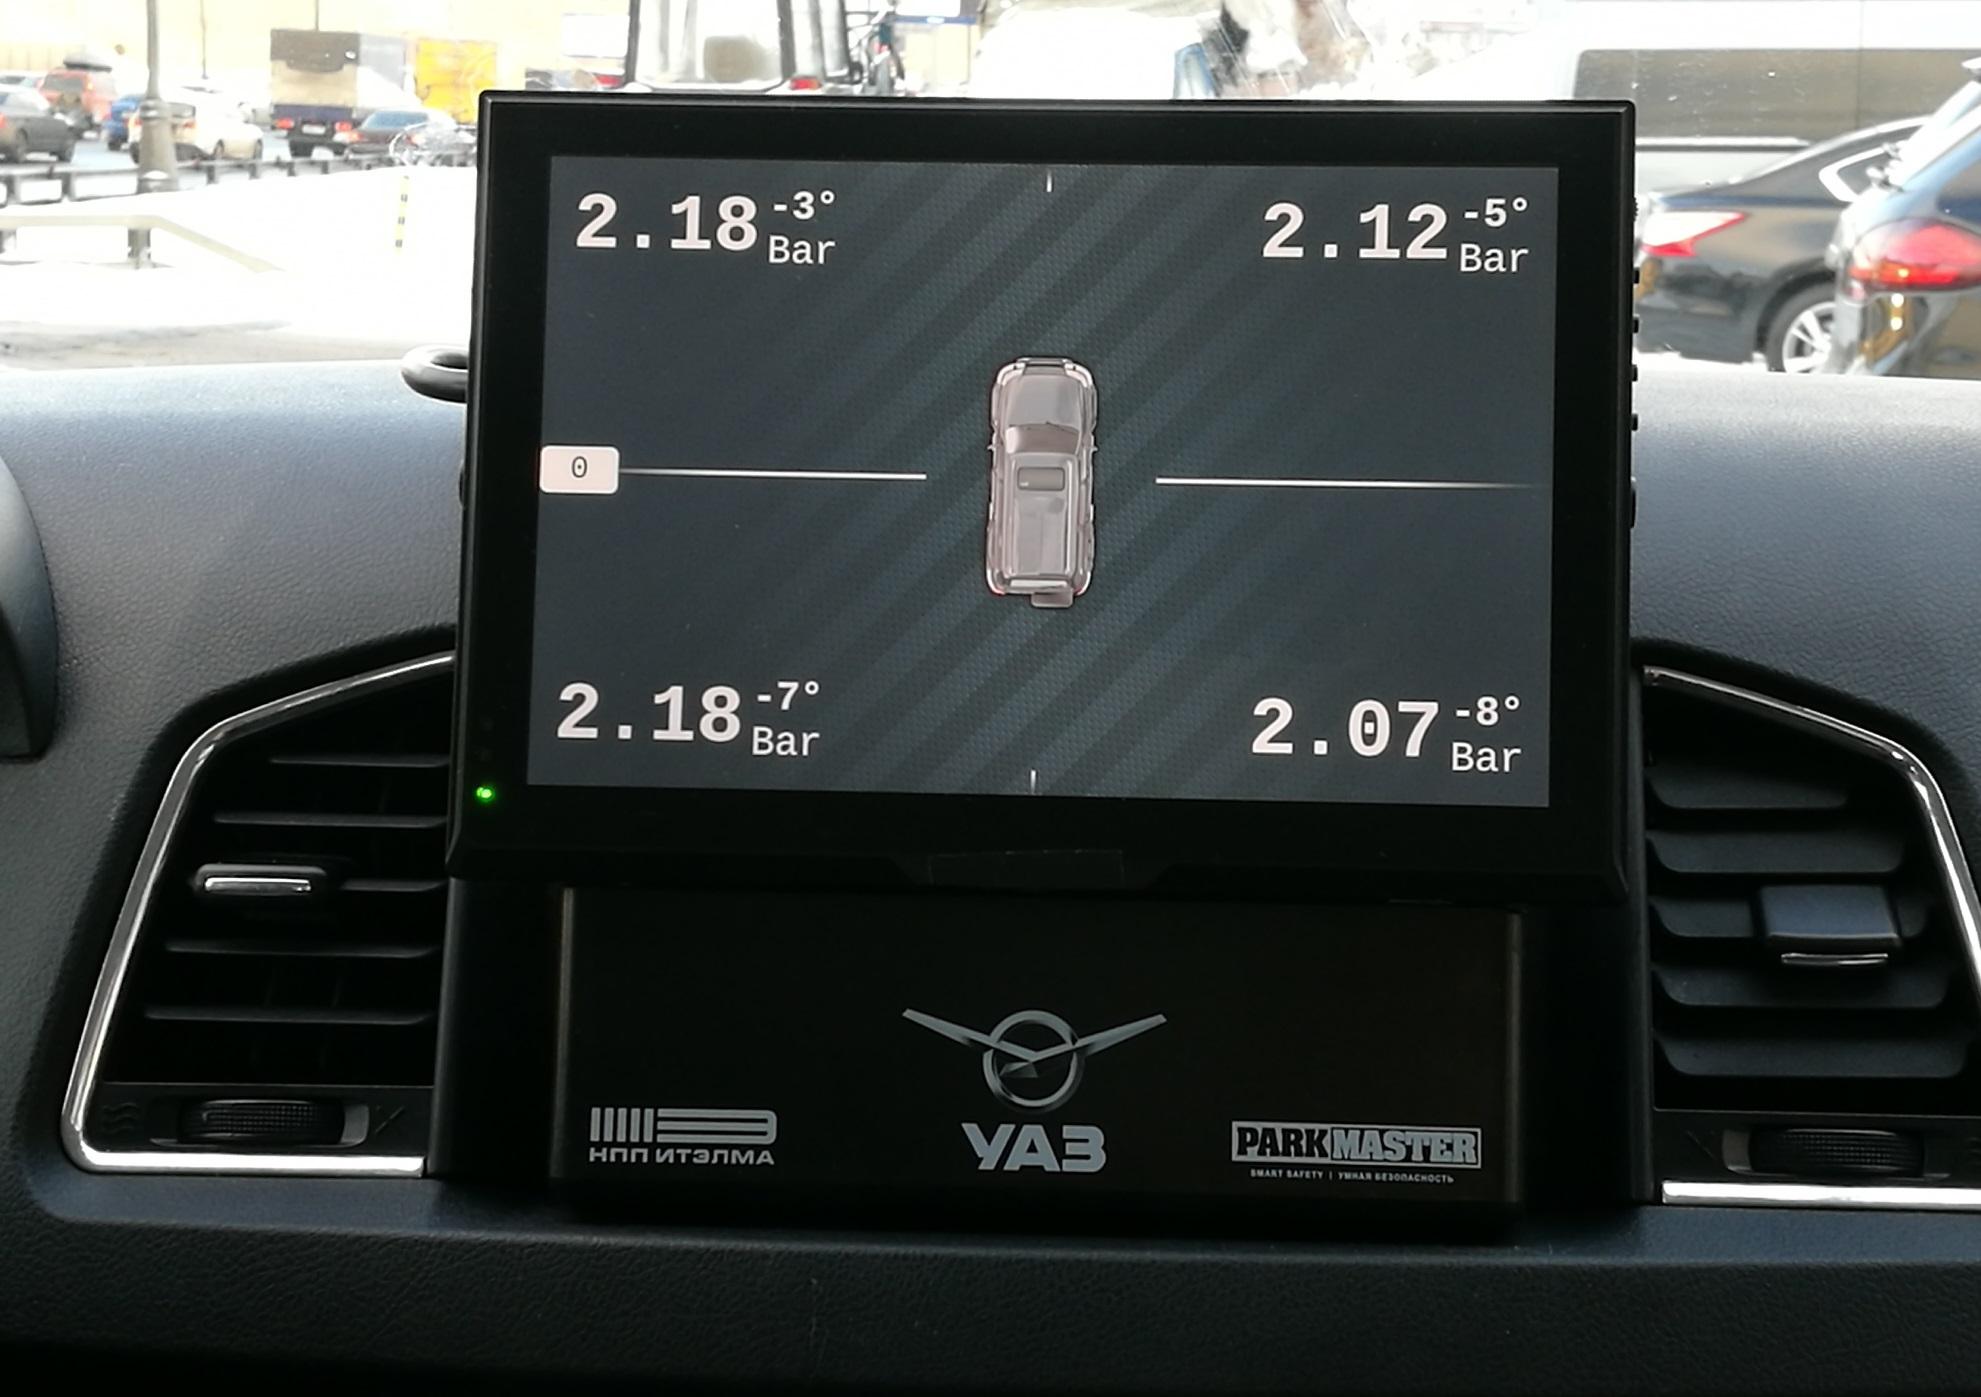 УАЗ представил тестовую версию УАЗ Патриот с телематическими сервисами